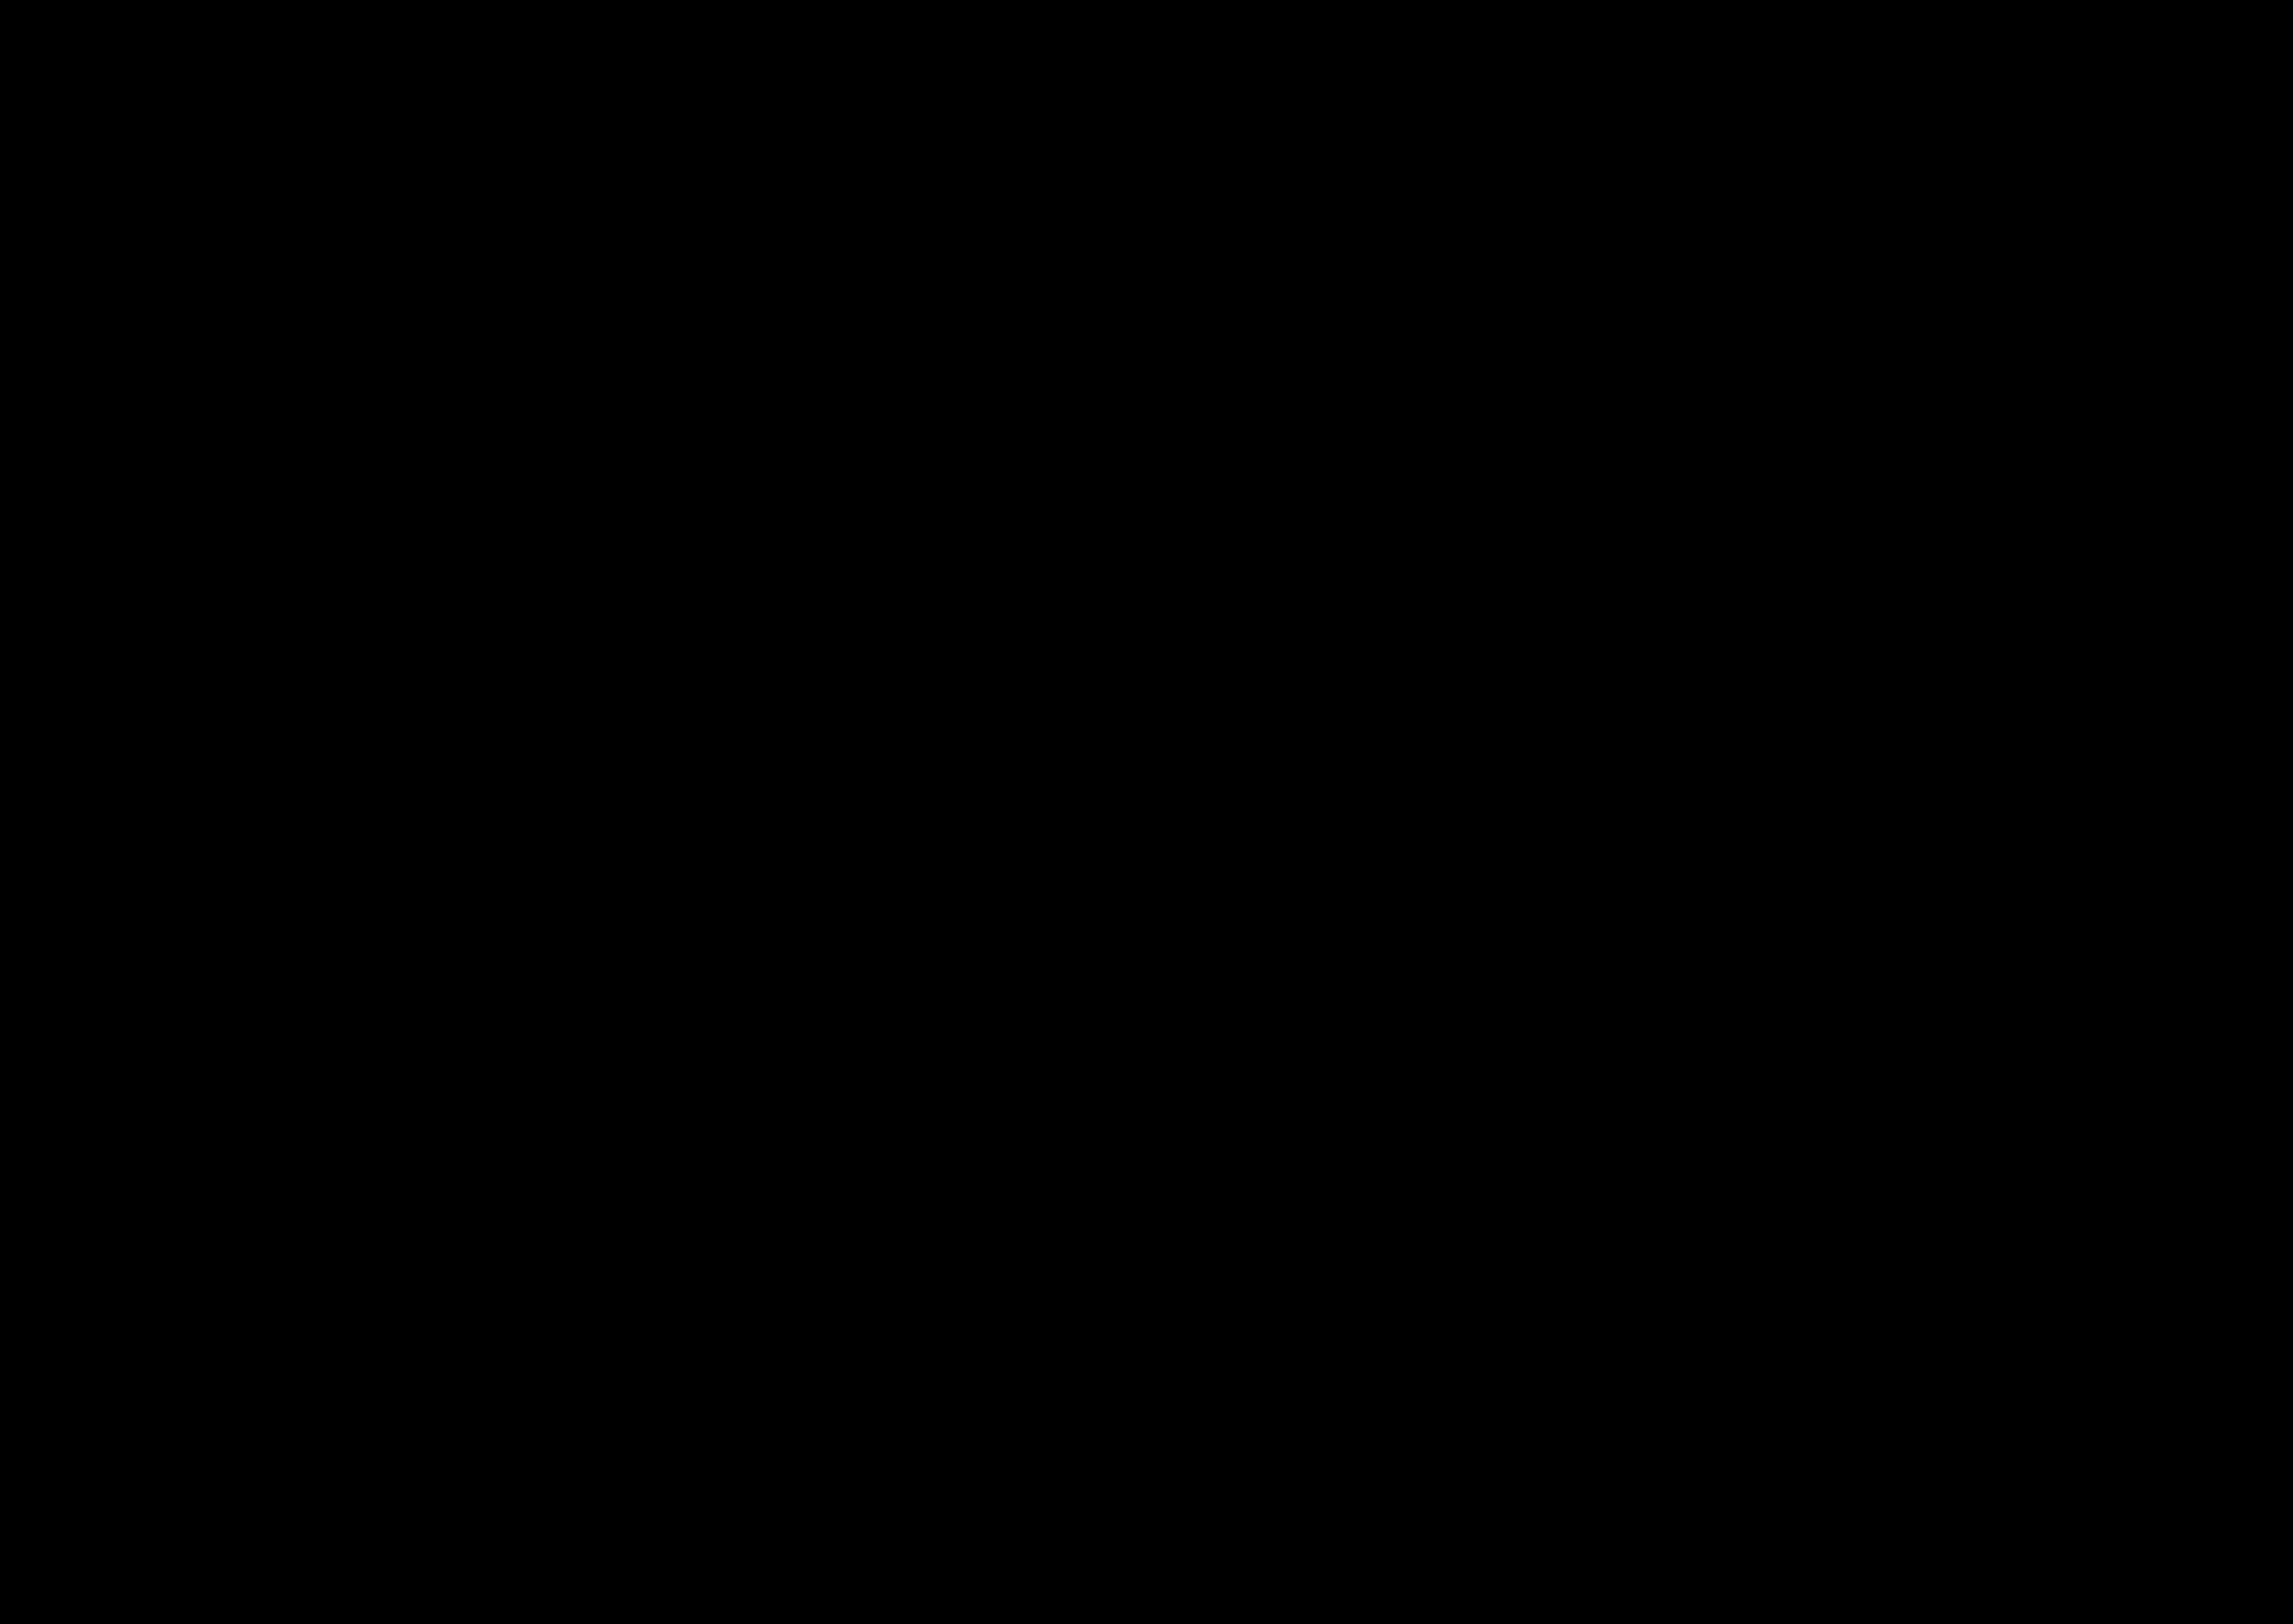 kassi-01.png